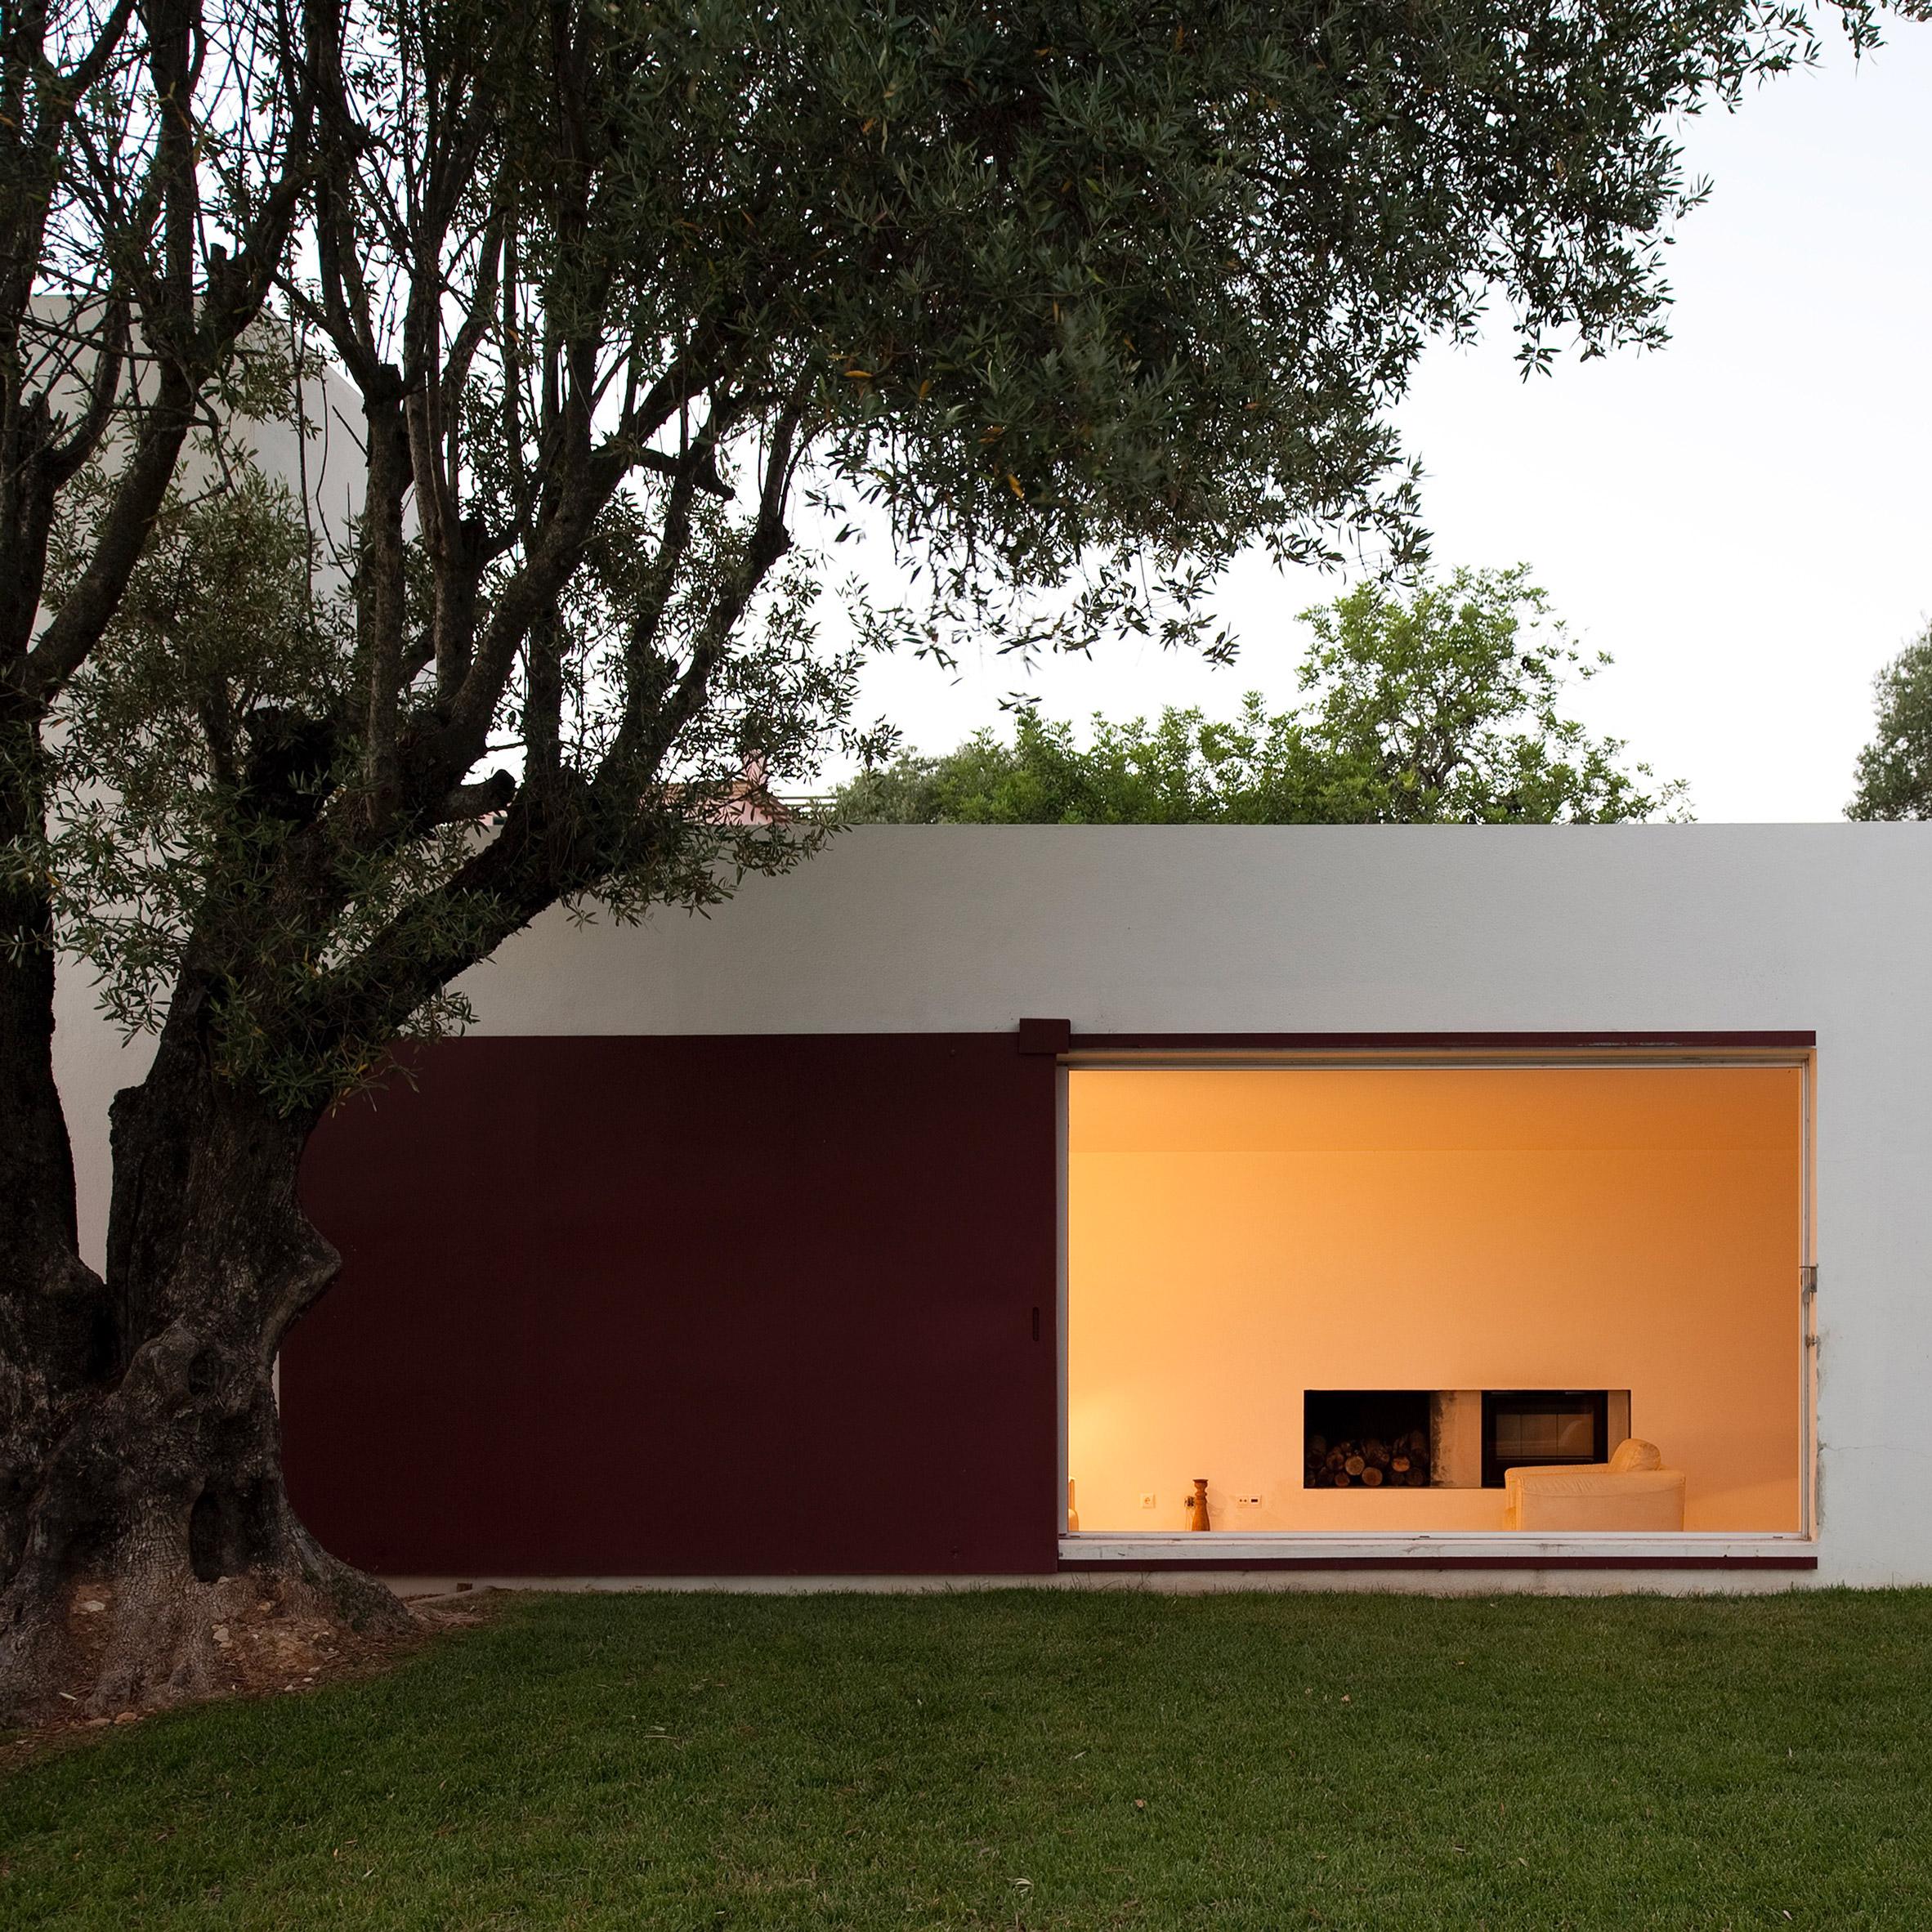 Urlaub Architektur's Holiday Architecture book roundup: Casa Agostos by Pedro Domingos